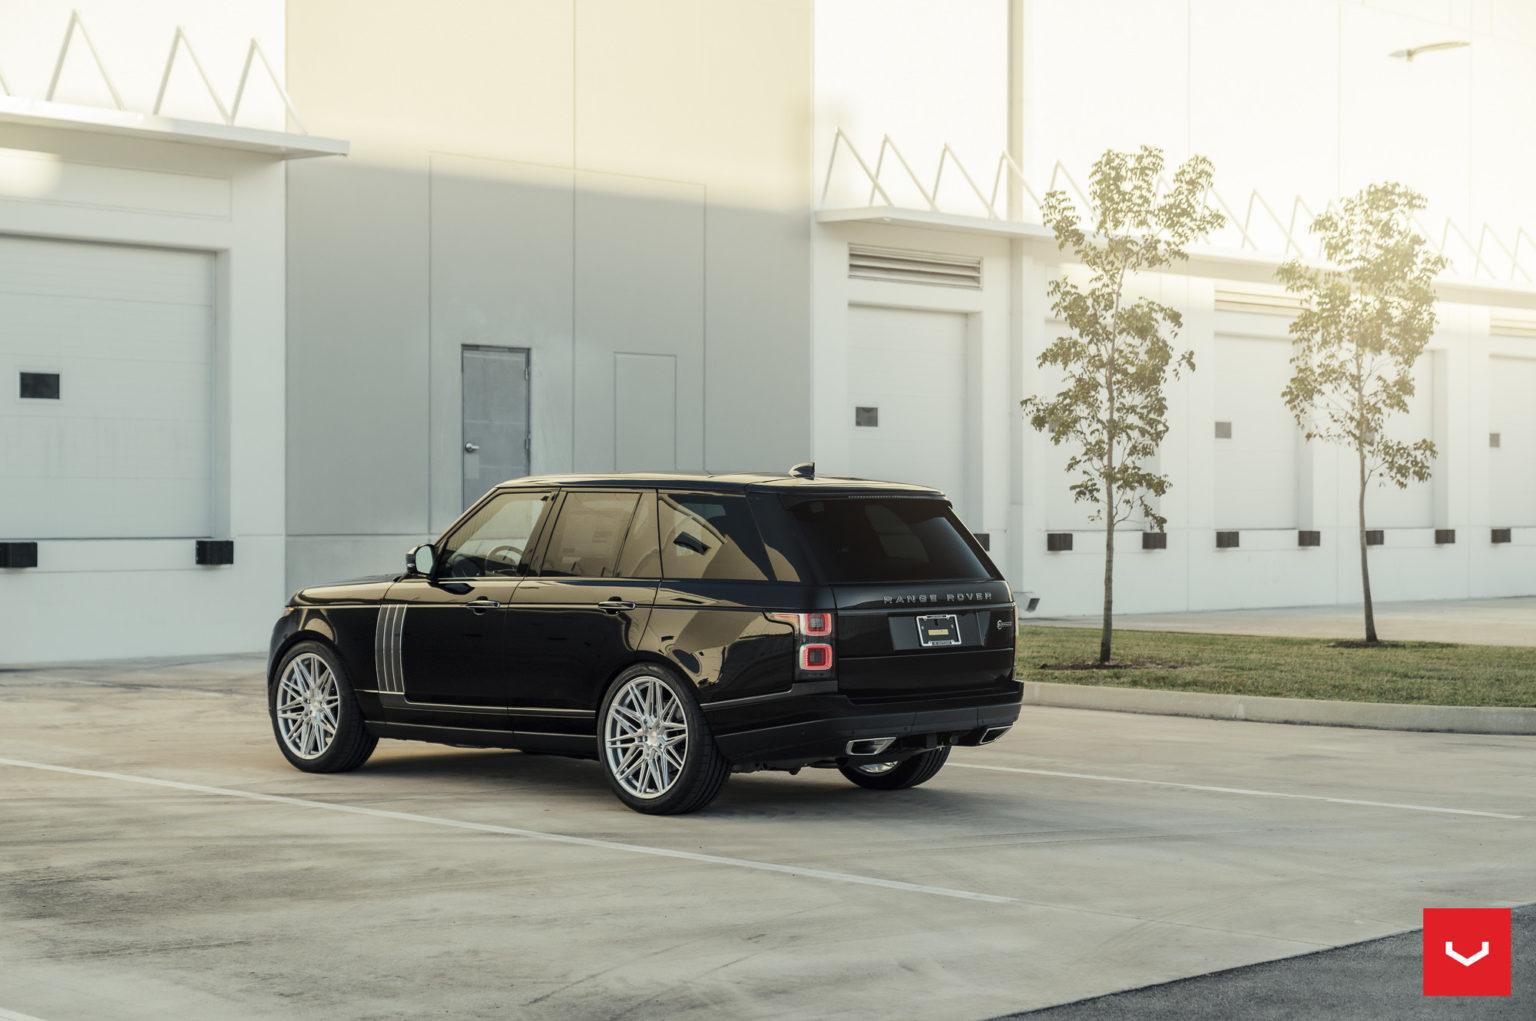 Land Rover Range Rover на литых дисках Vossen HF-7 Москва Россия 1